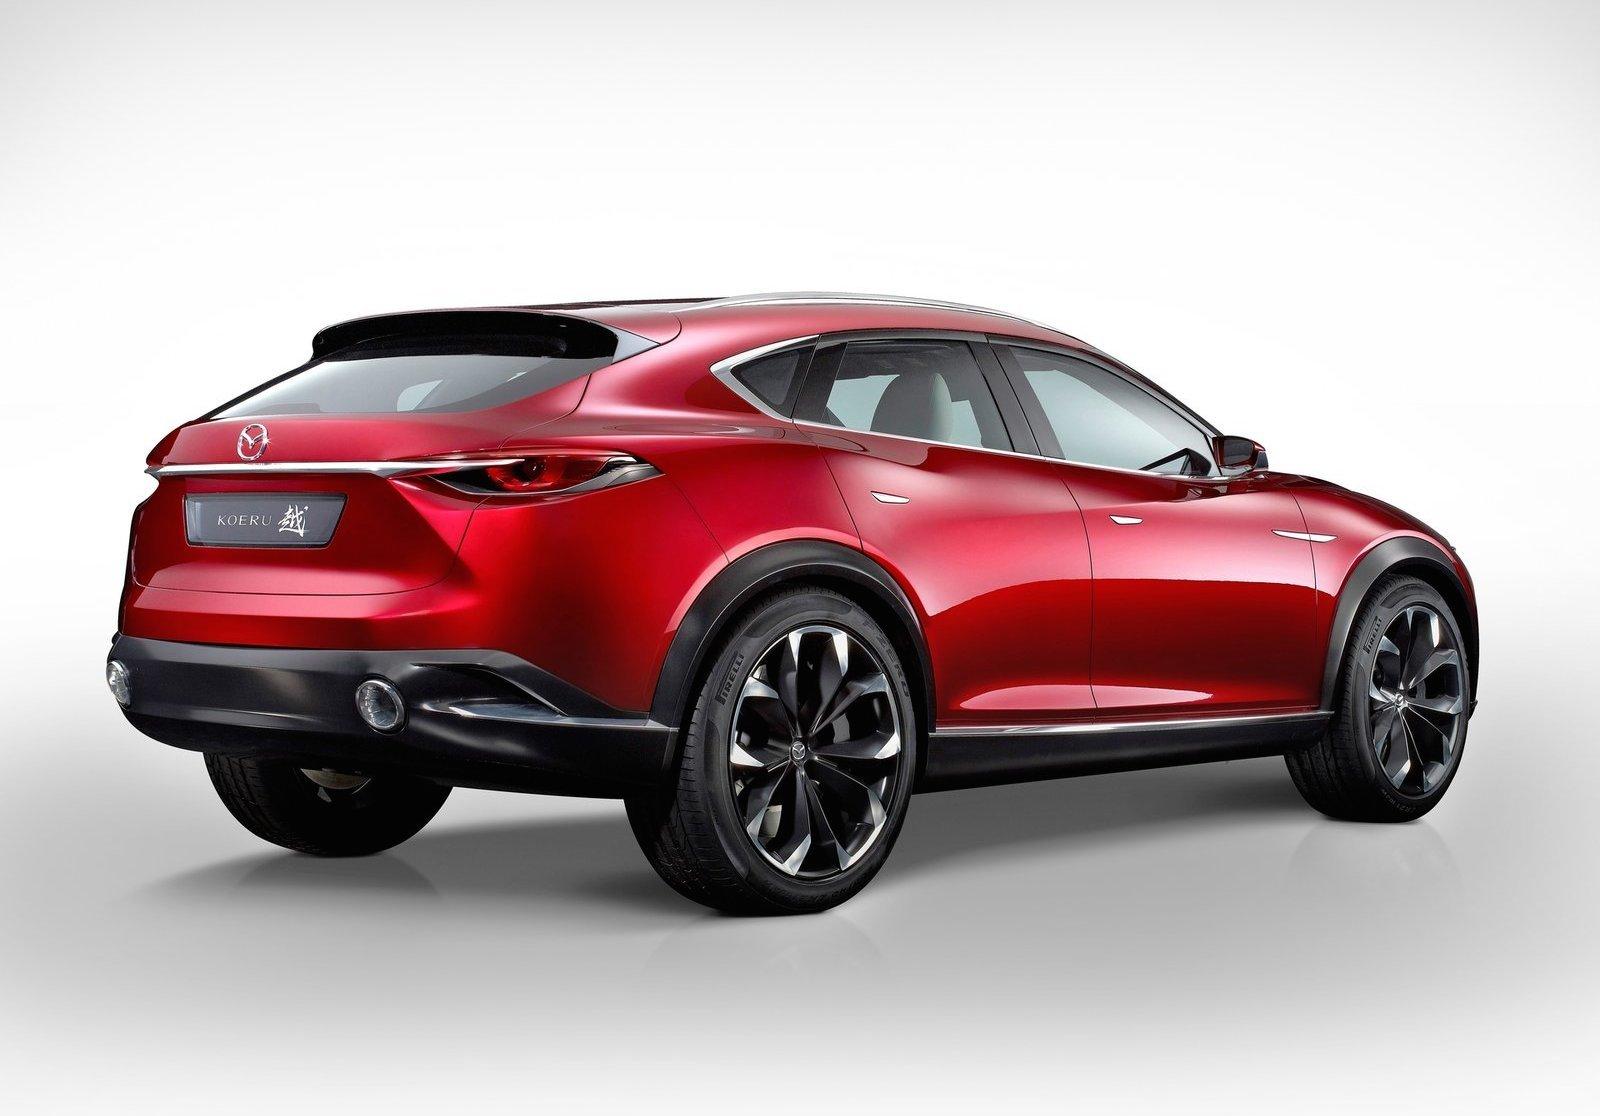 Foto de Mazda Koeru Concept (4/11)